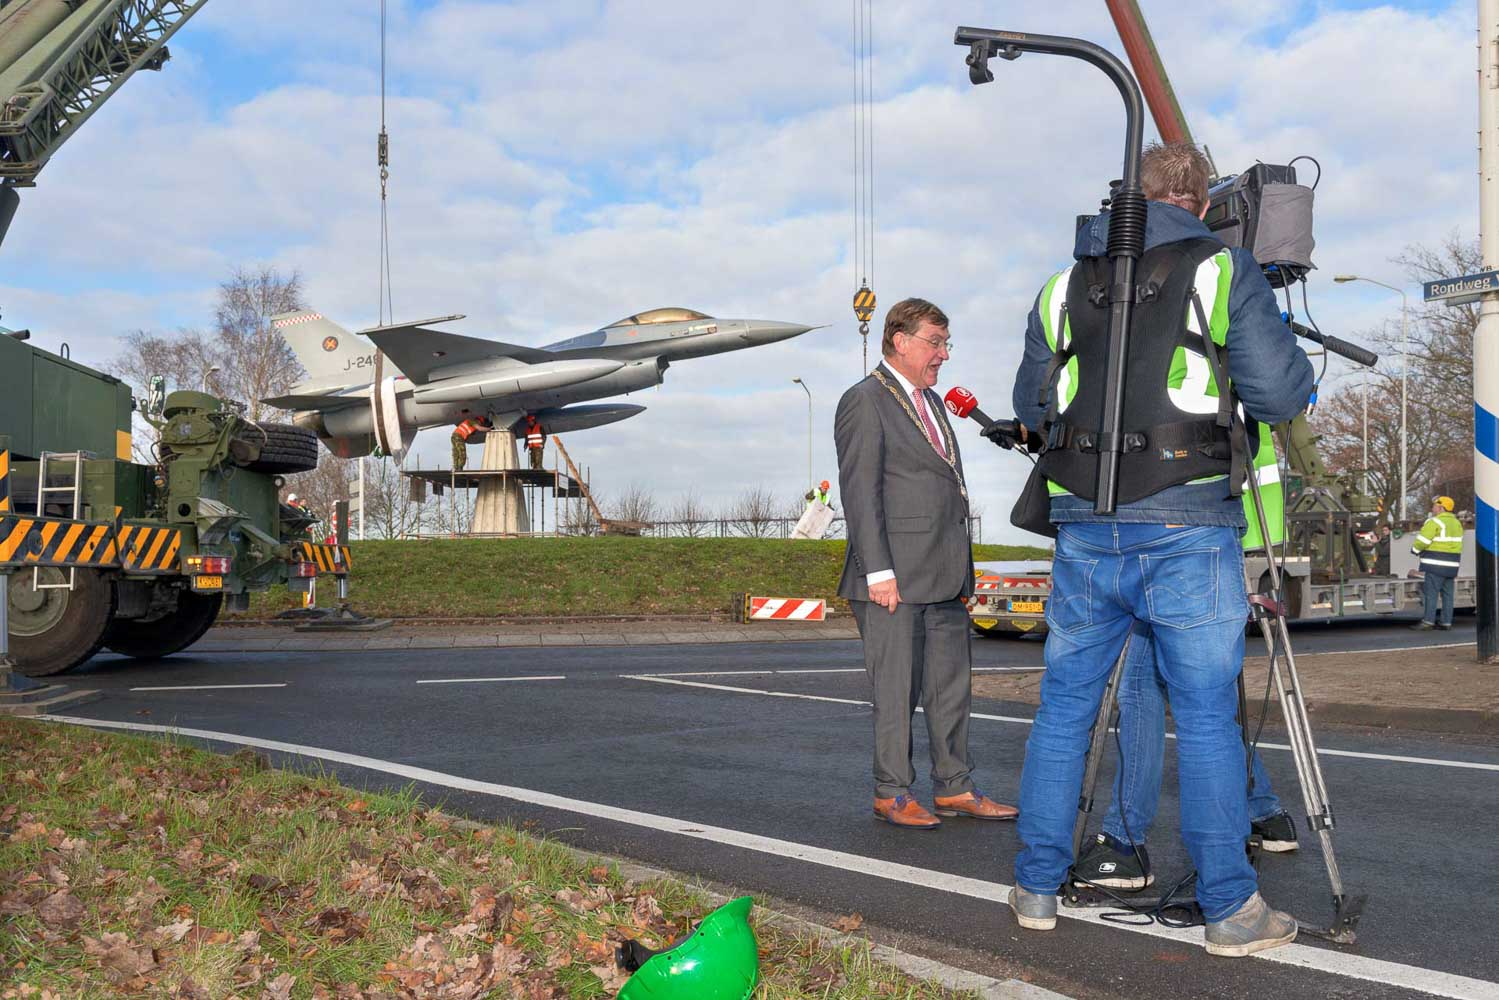 Plaatsing f16 rotonde Volkel | sasfotos nl